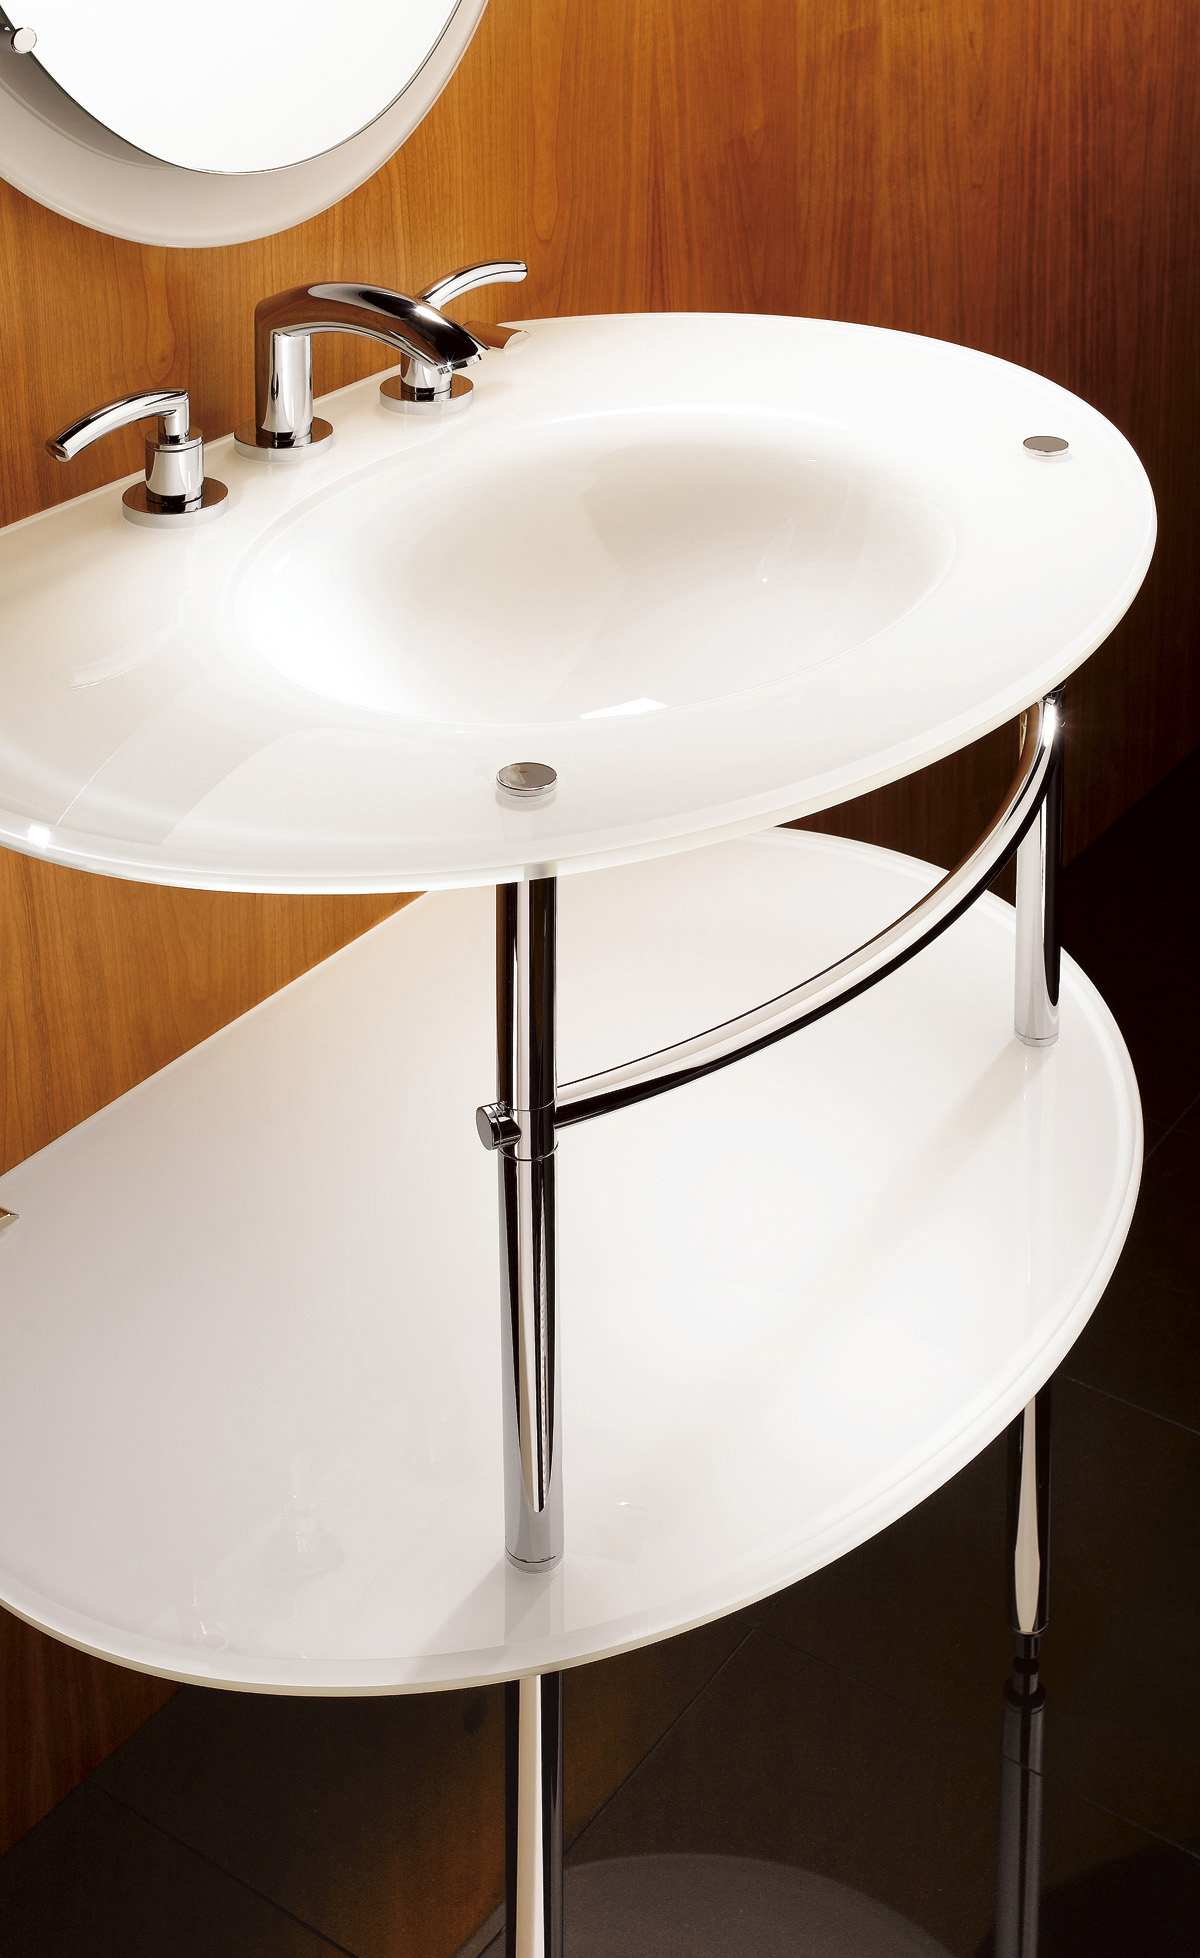 Toilets / Sinks U0026 More